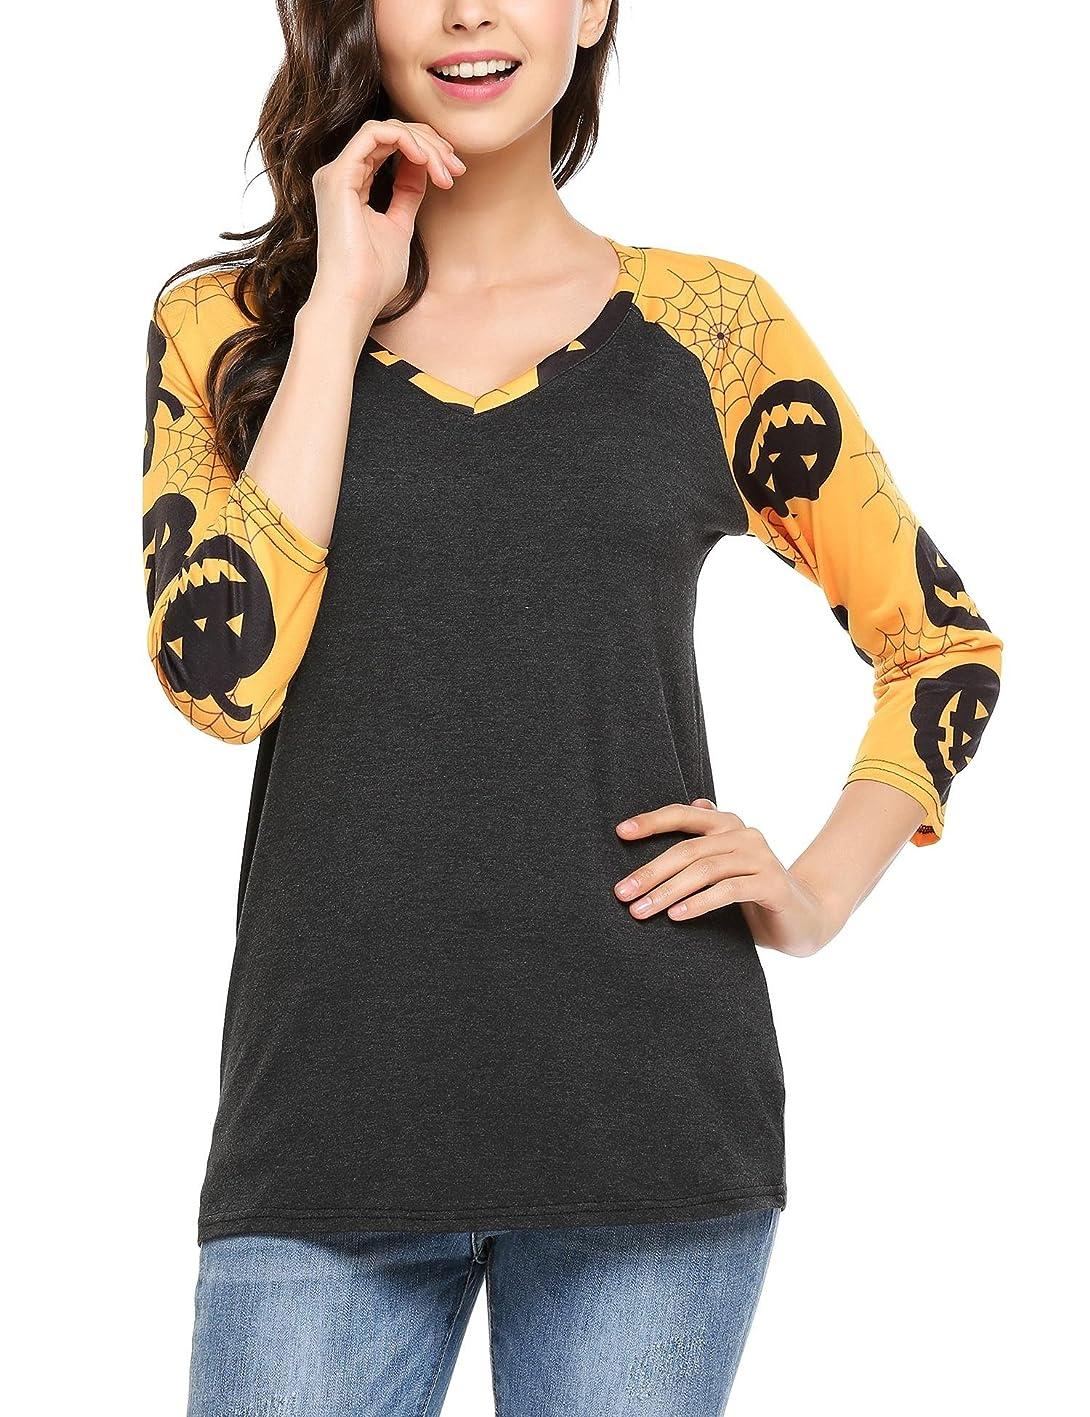 ELESOL Women's Long Sleeve V Neck Loose Shirt Floral Printed Raglan Top Tunic yaixypdiaev179